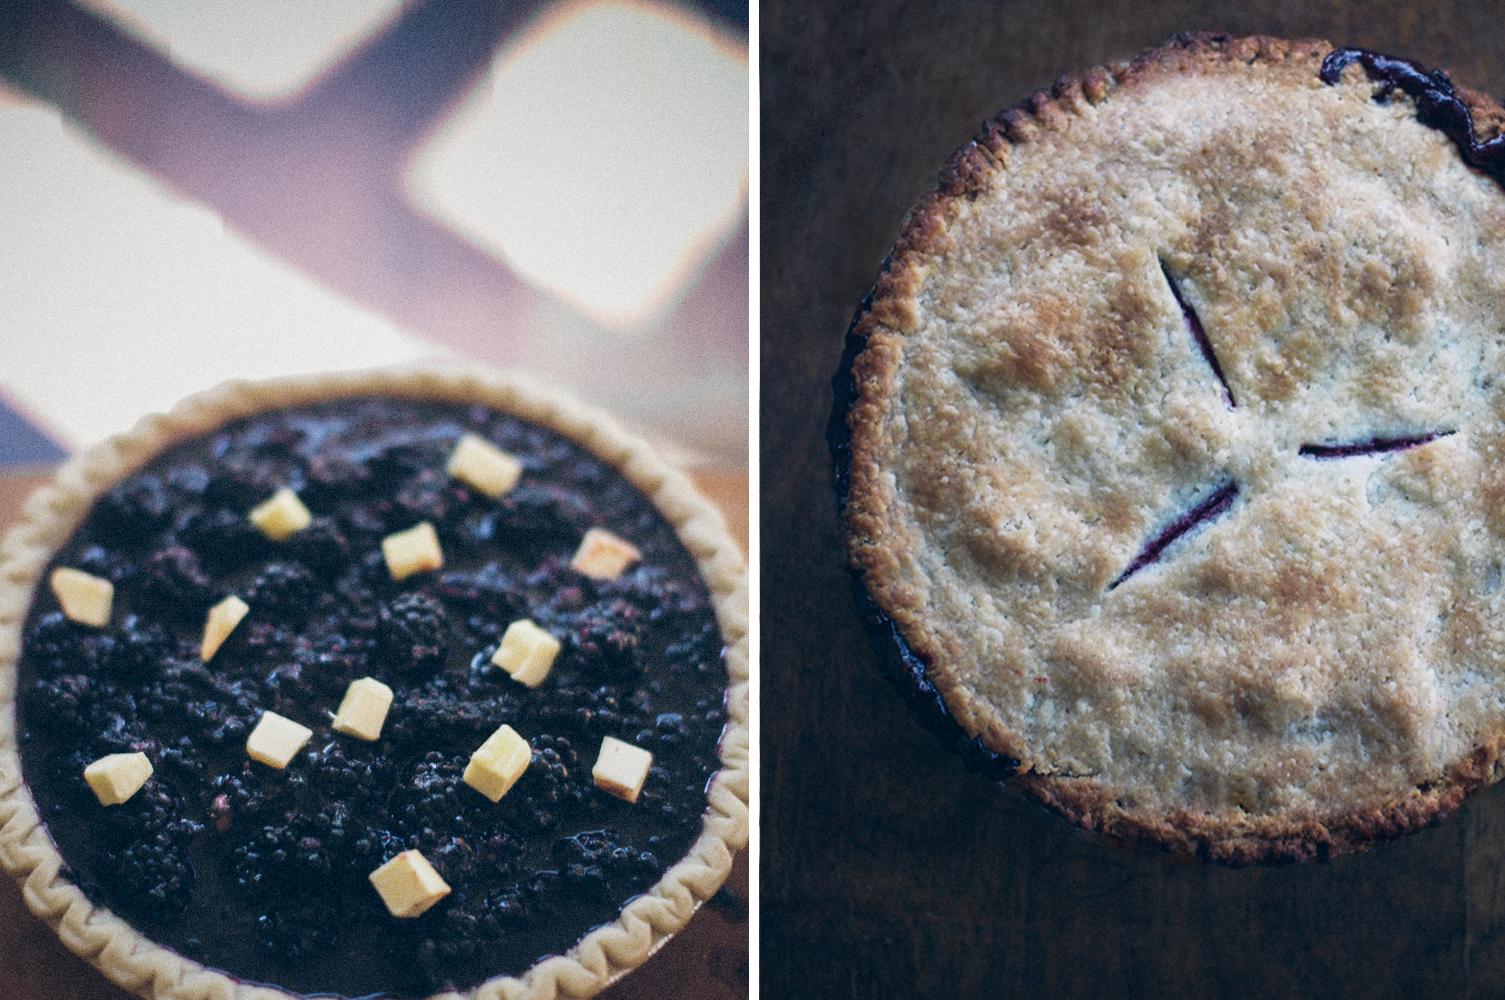 Black-Berry-Pie-9926.jpg